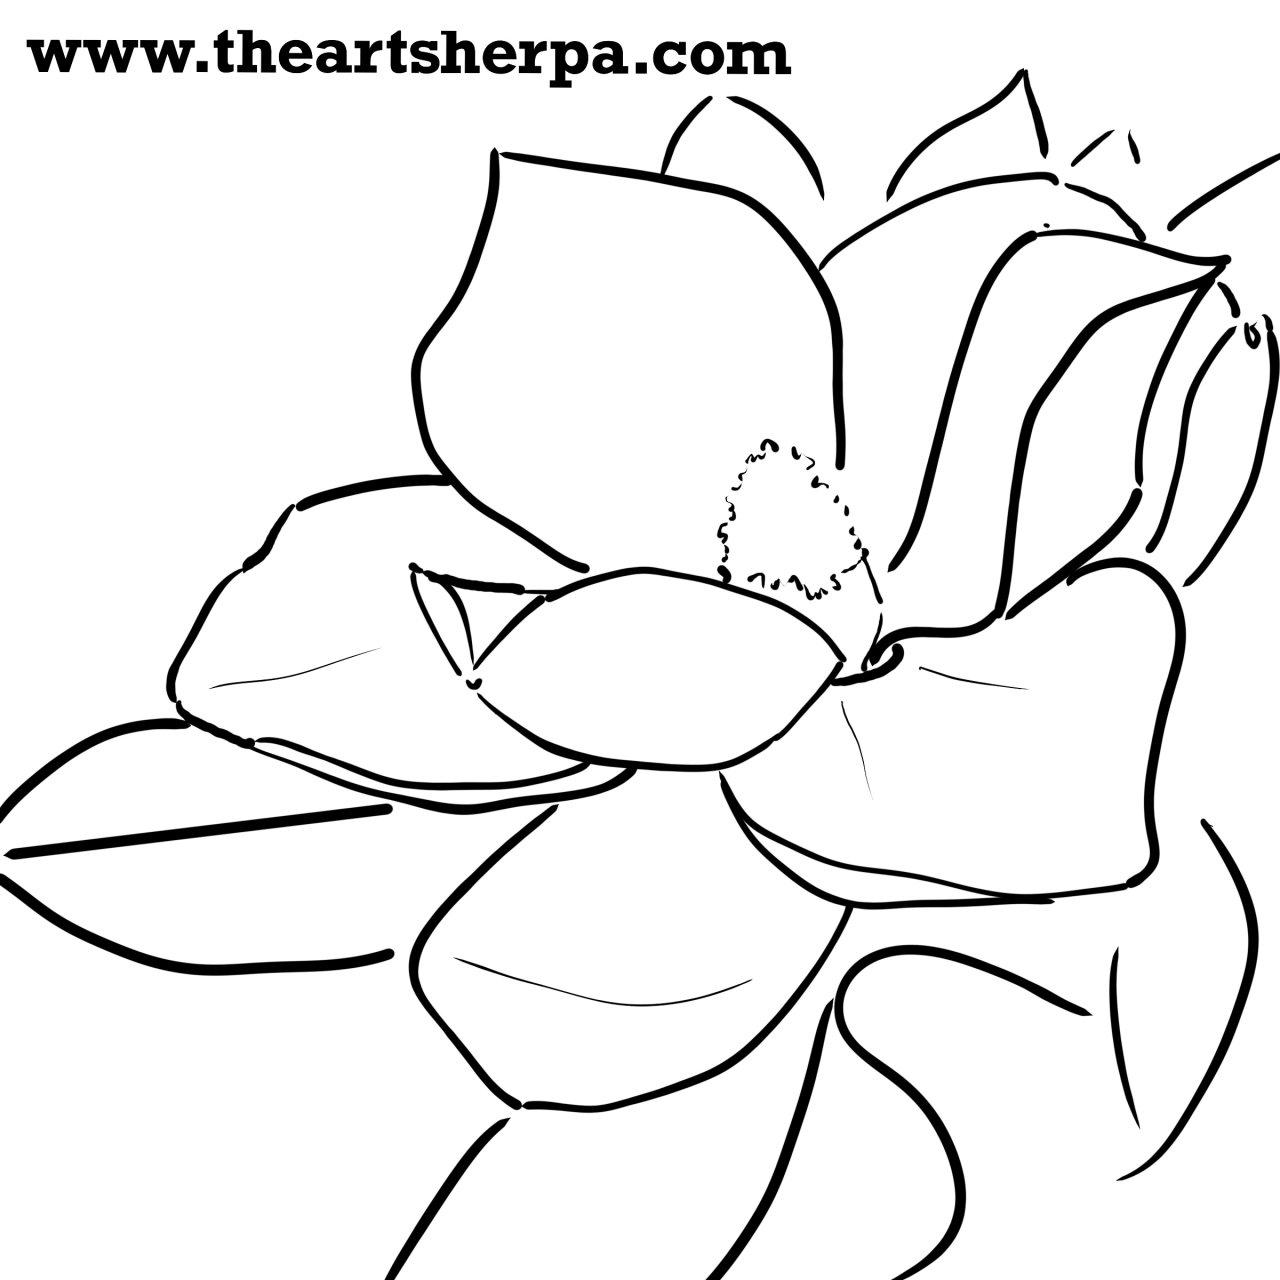 magnolia Traceable  2021